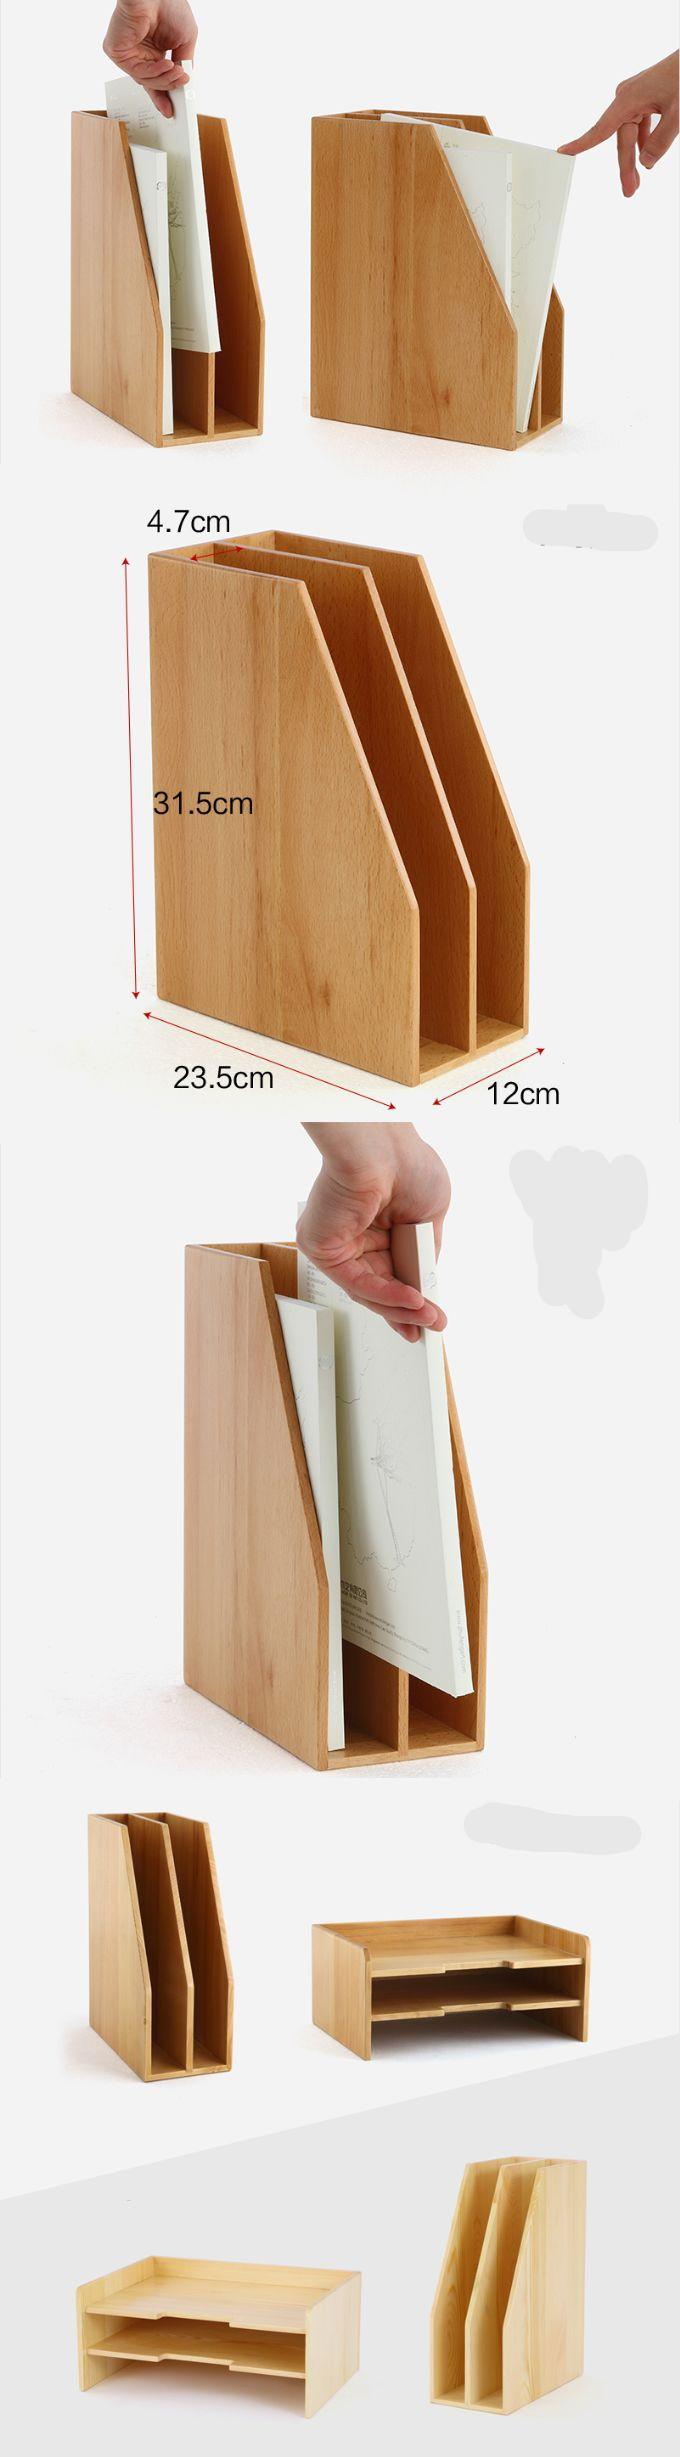 Bamboo Wooden Magazine Letter Holder Rack Storage